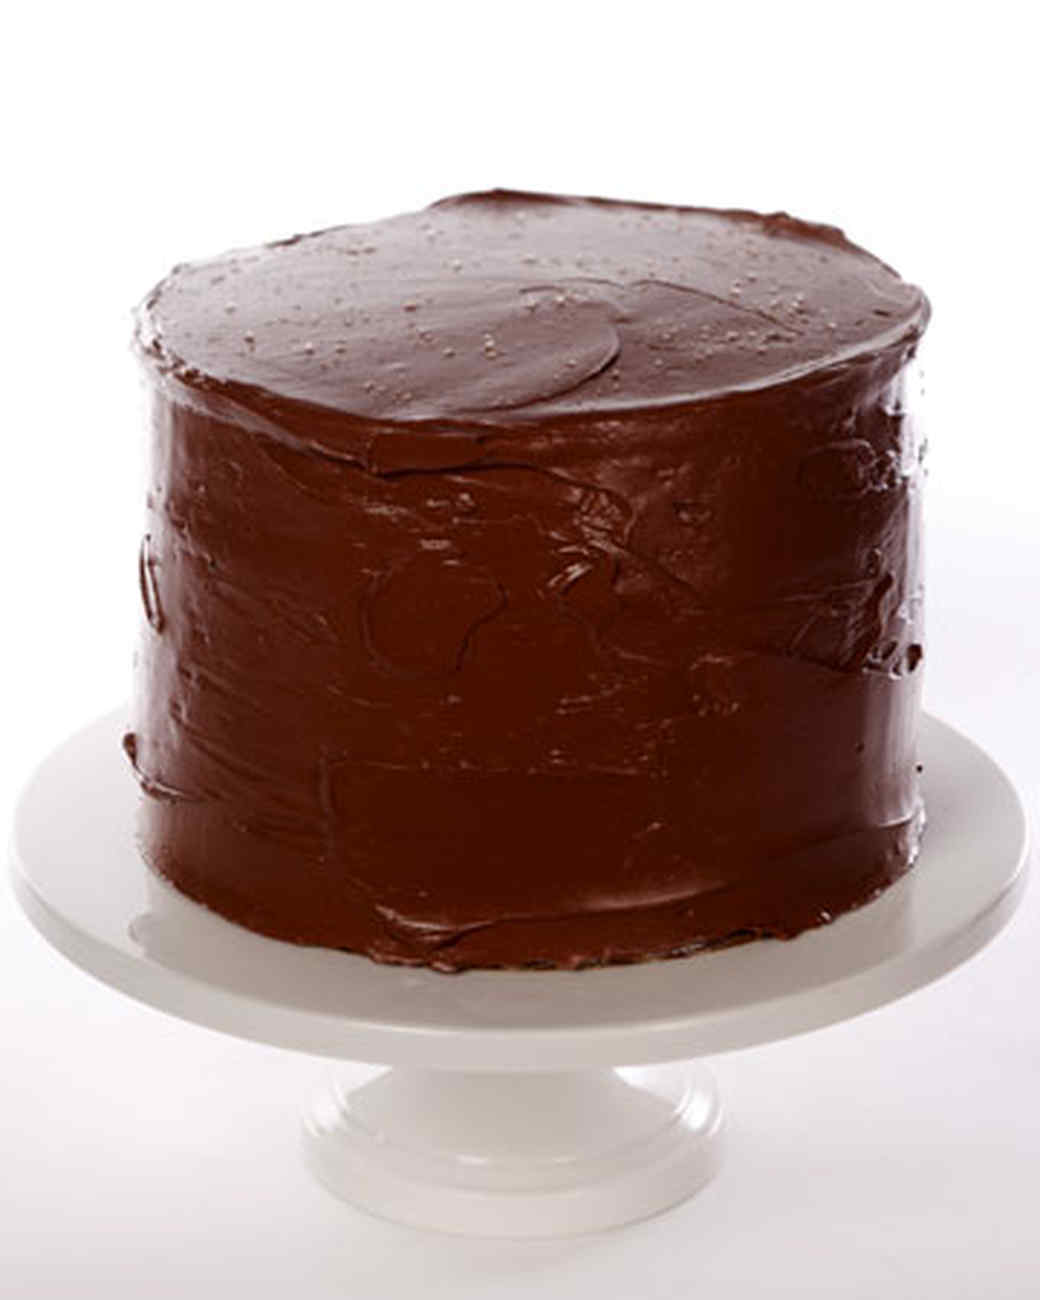 Most delicious chocolate cake recipe Food next recipes